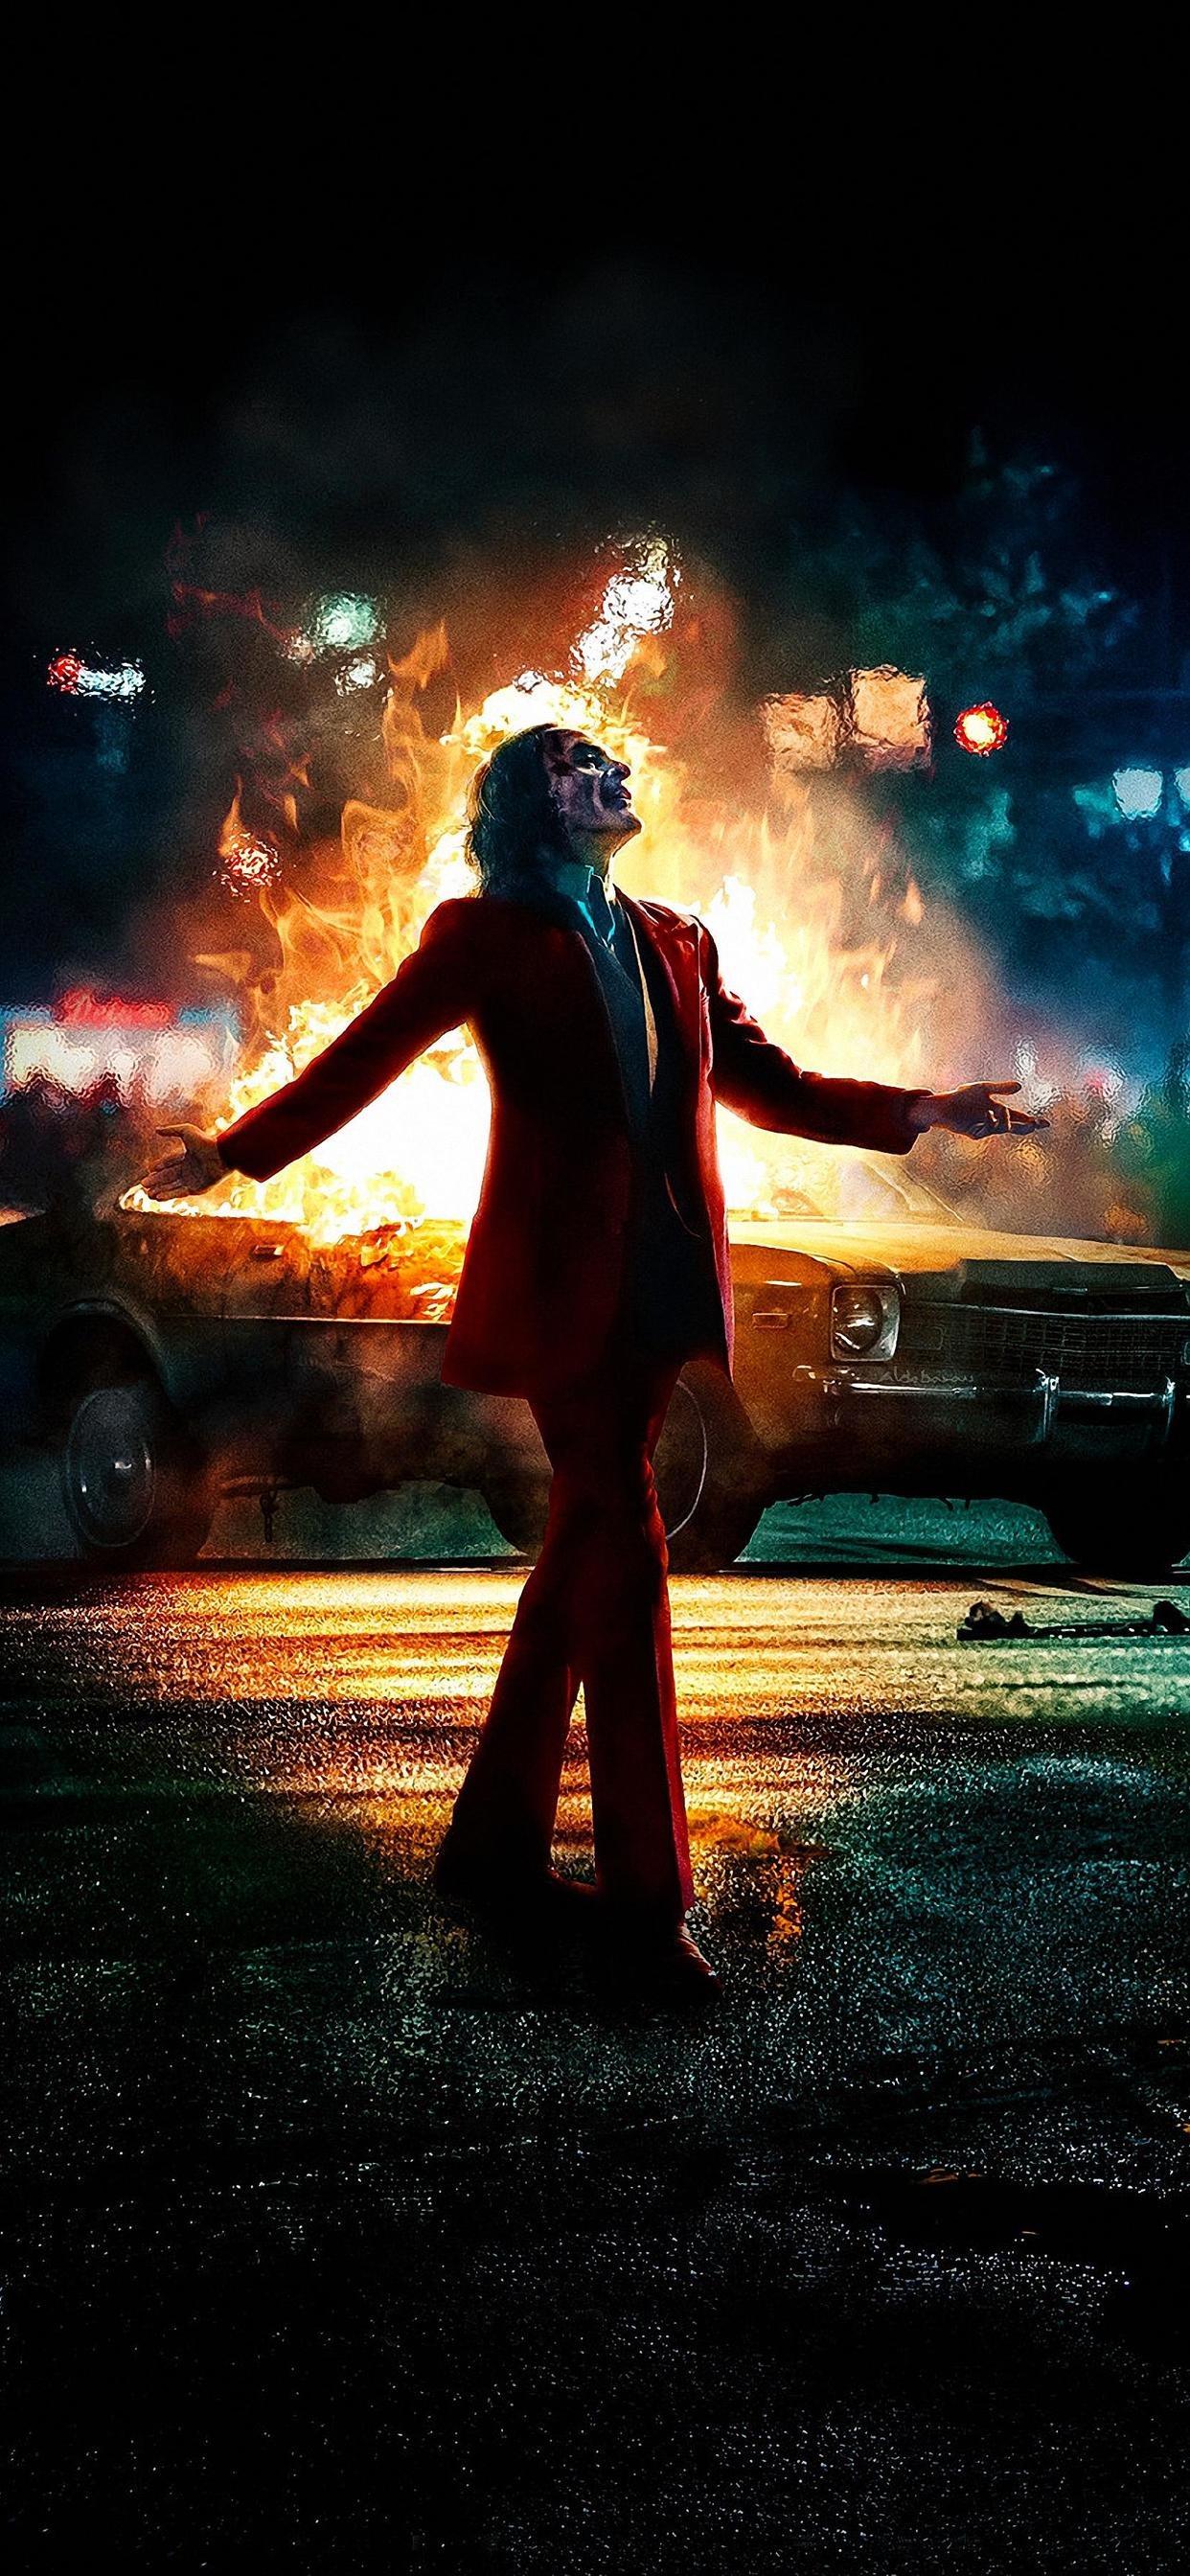 Joker Imax Poster Iphone 11 Wallpapers Free Download